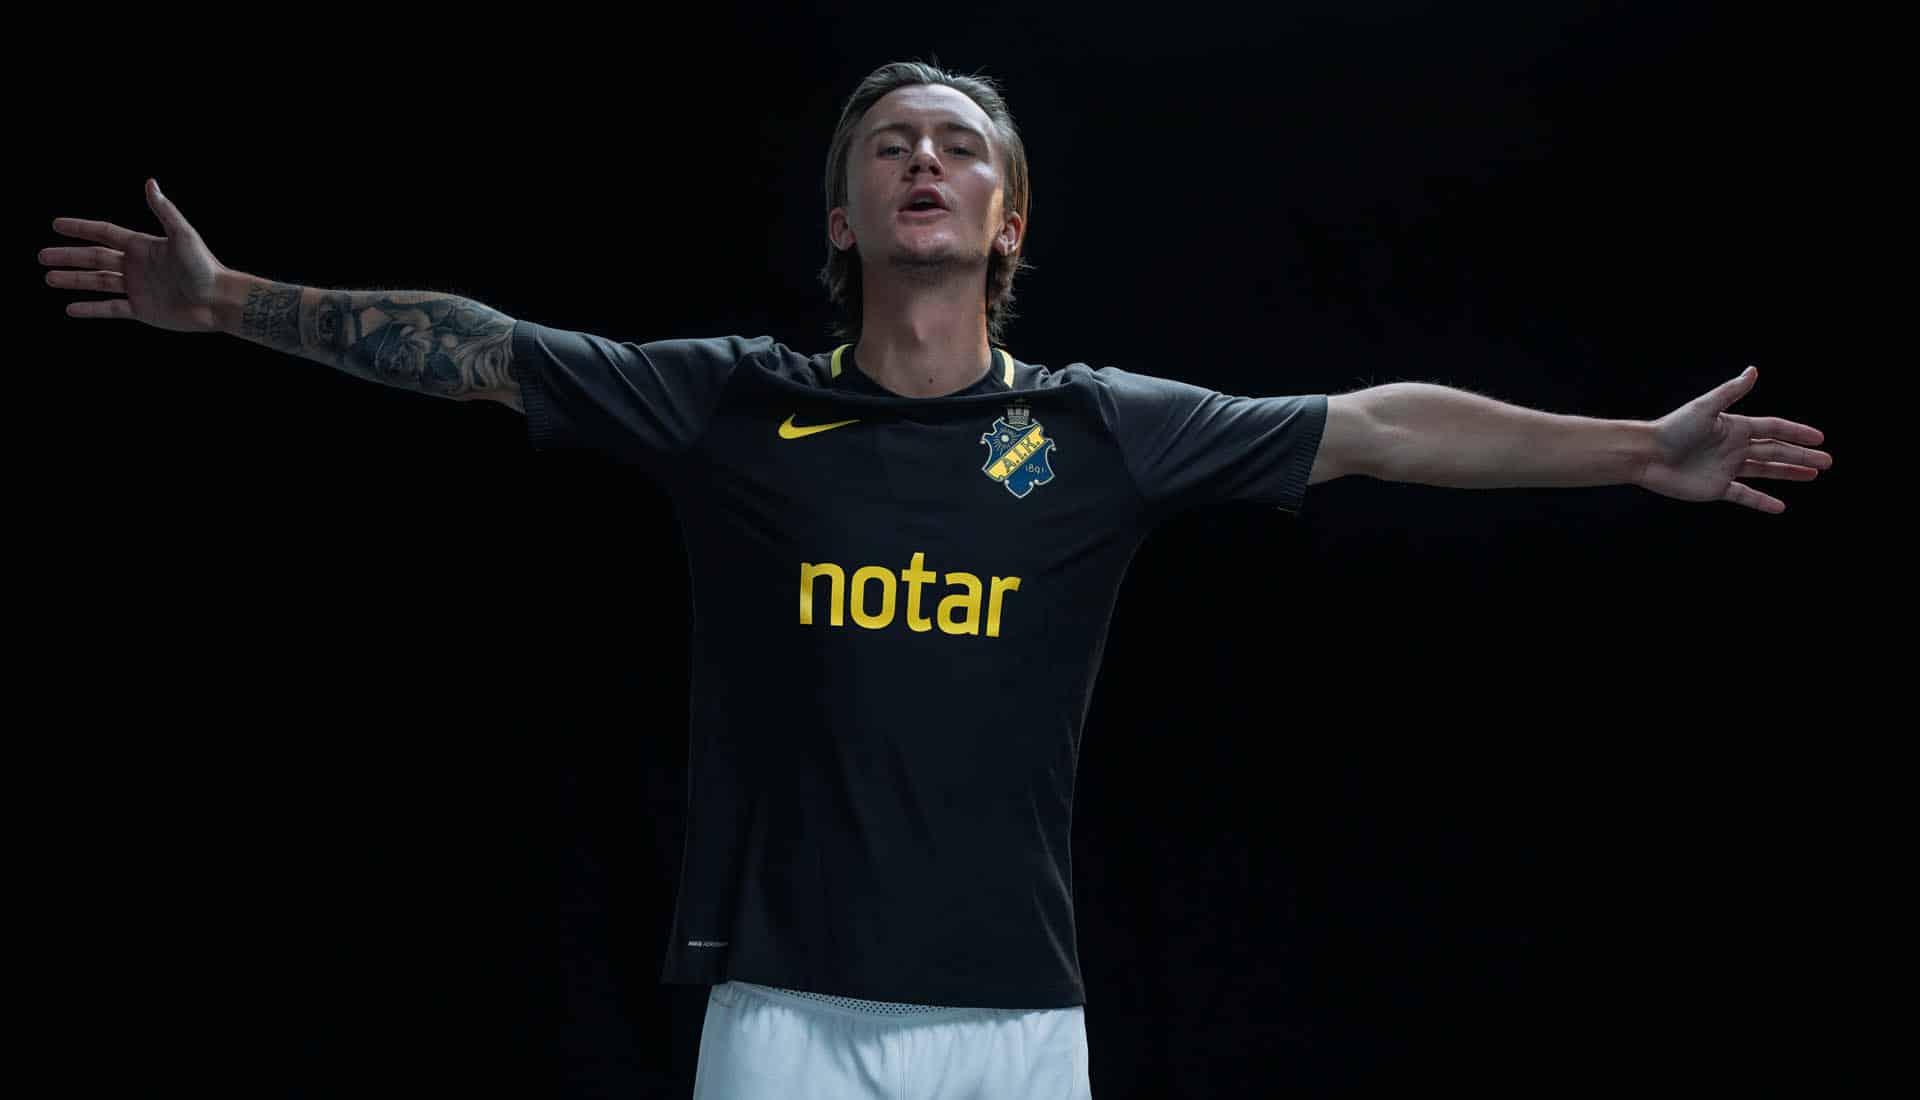 maillot-football-Nike-AIK-domicile-2018-img1